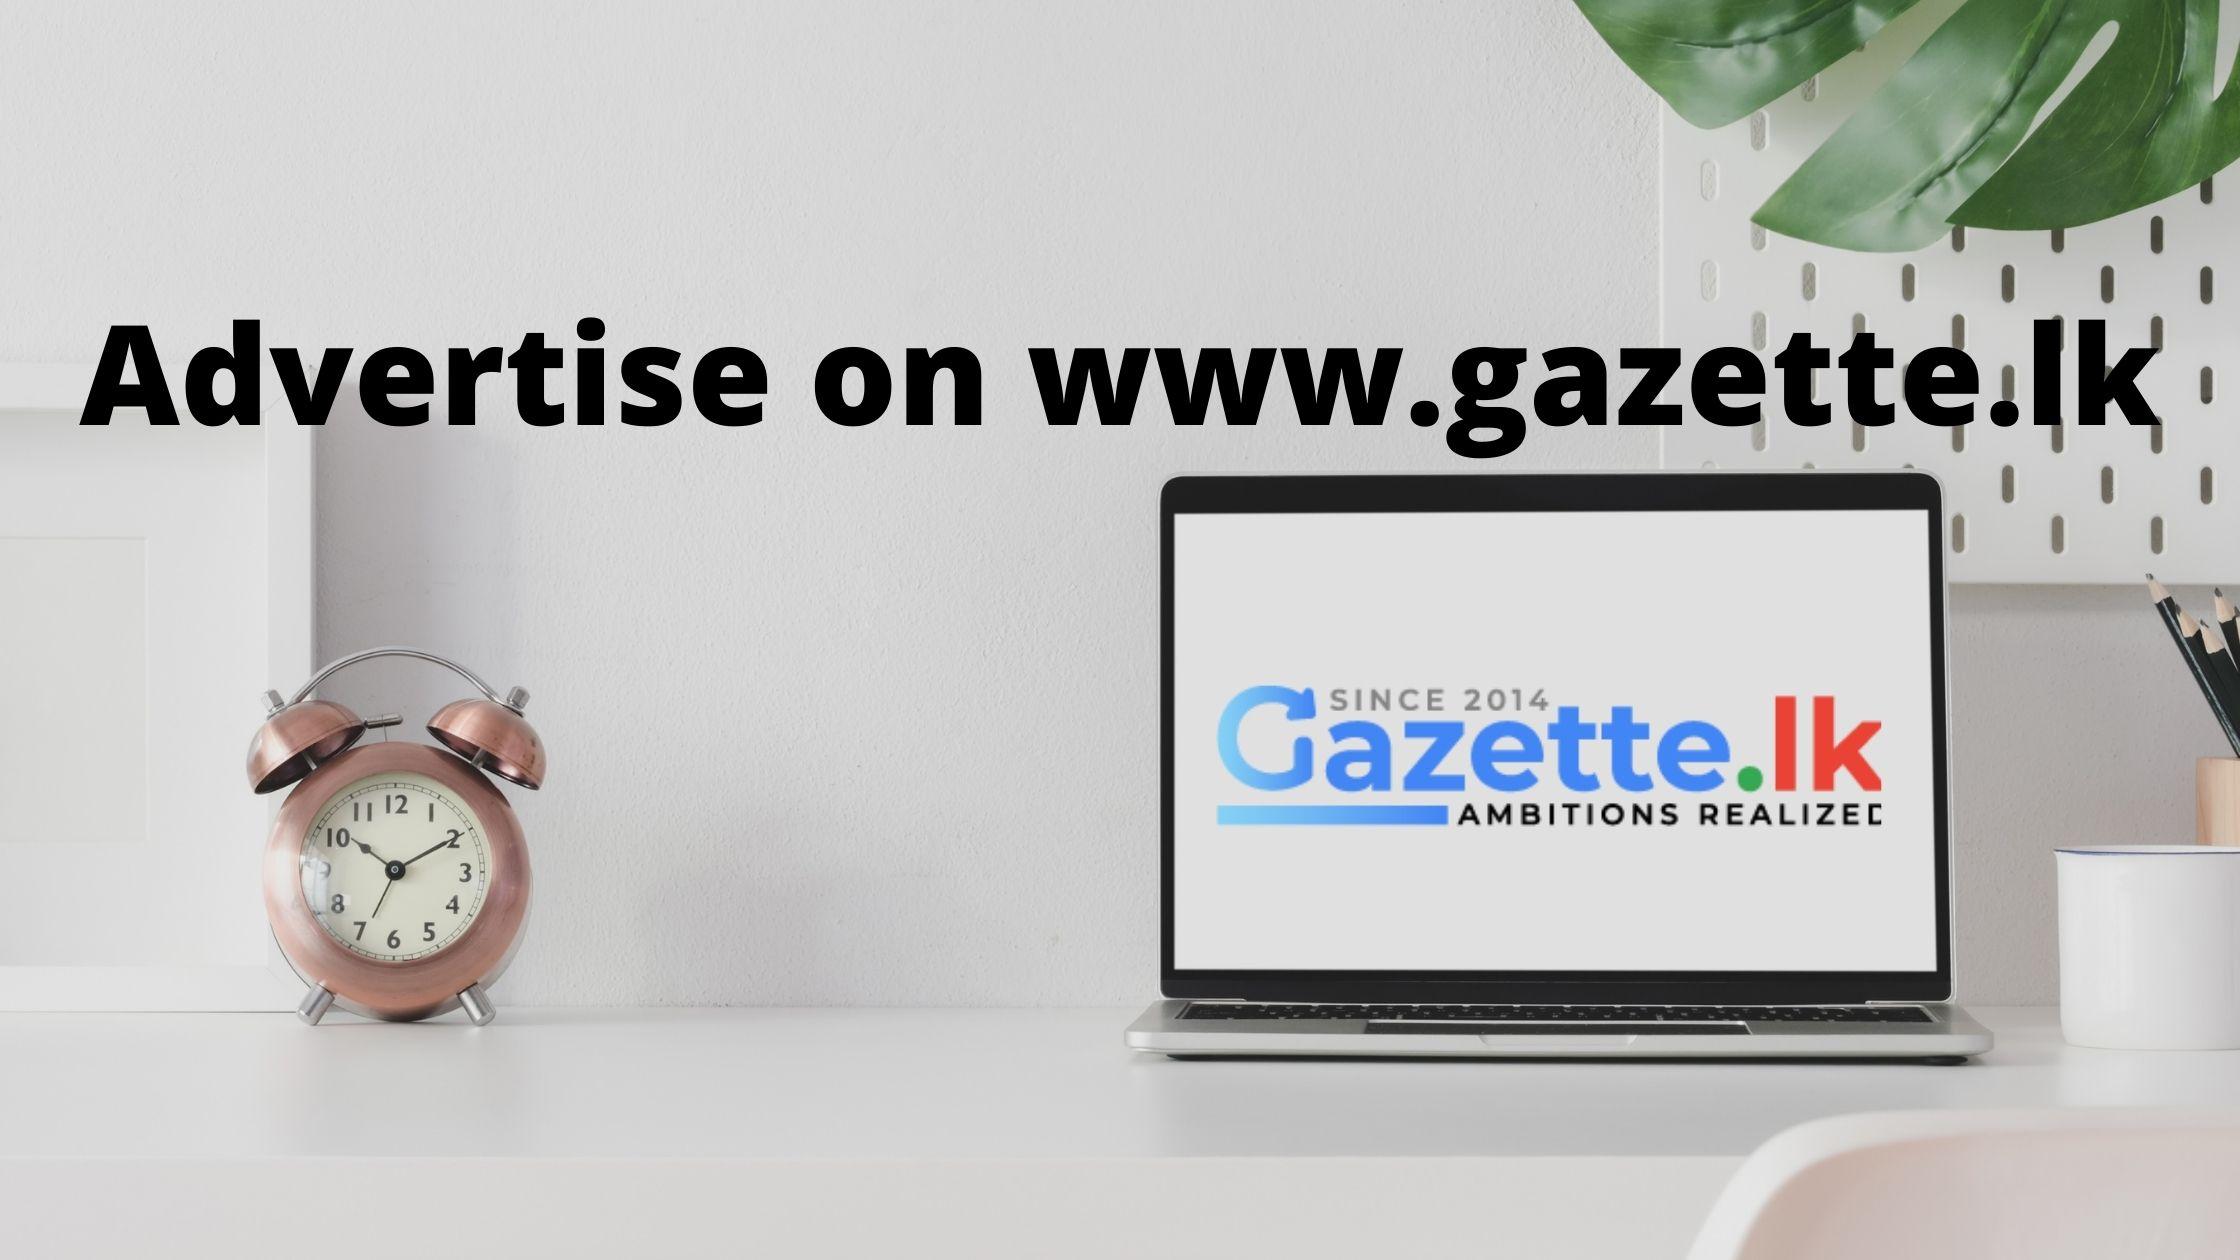 advertise on gazette.lk